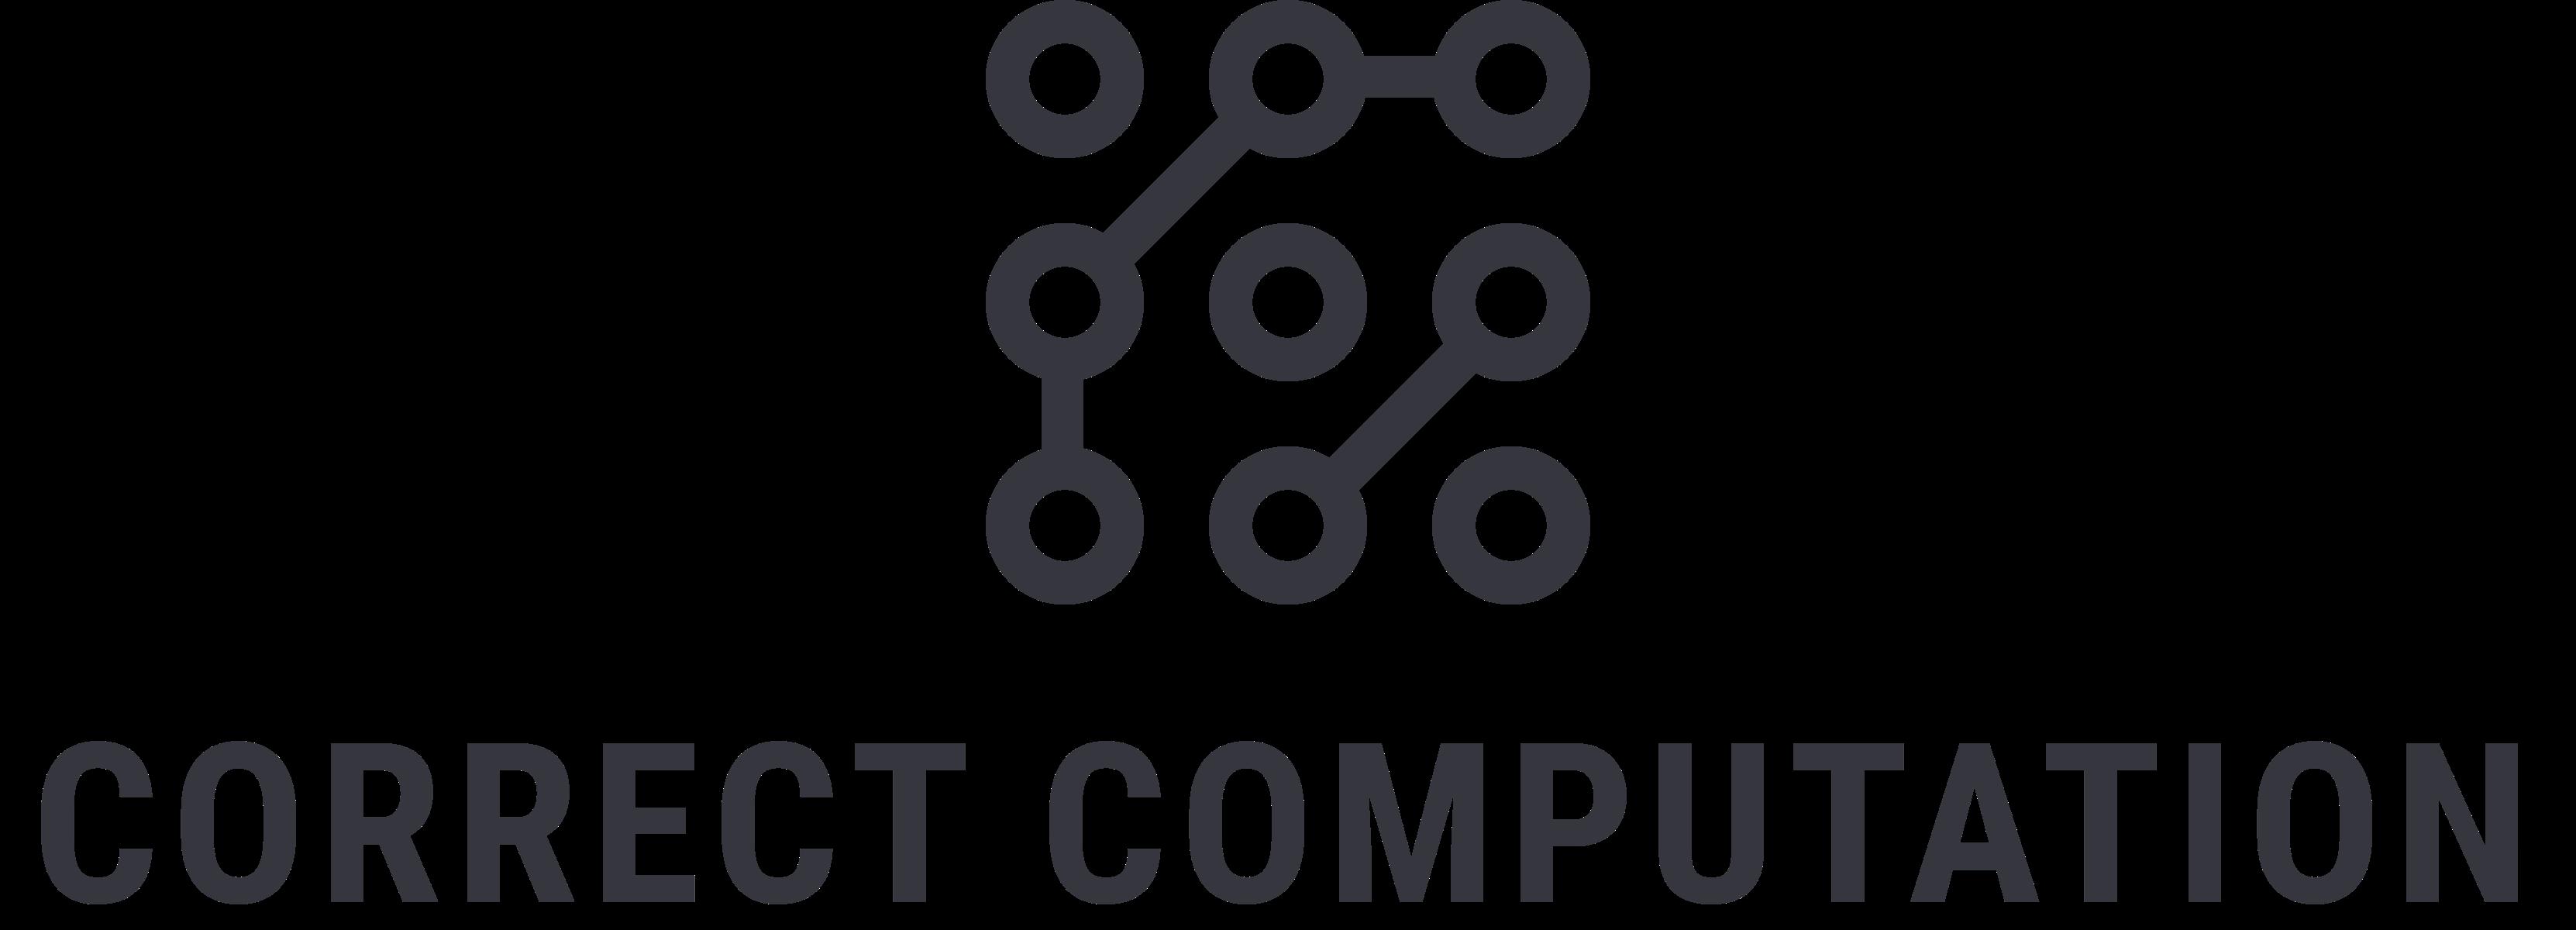 Correct Computation